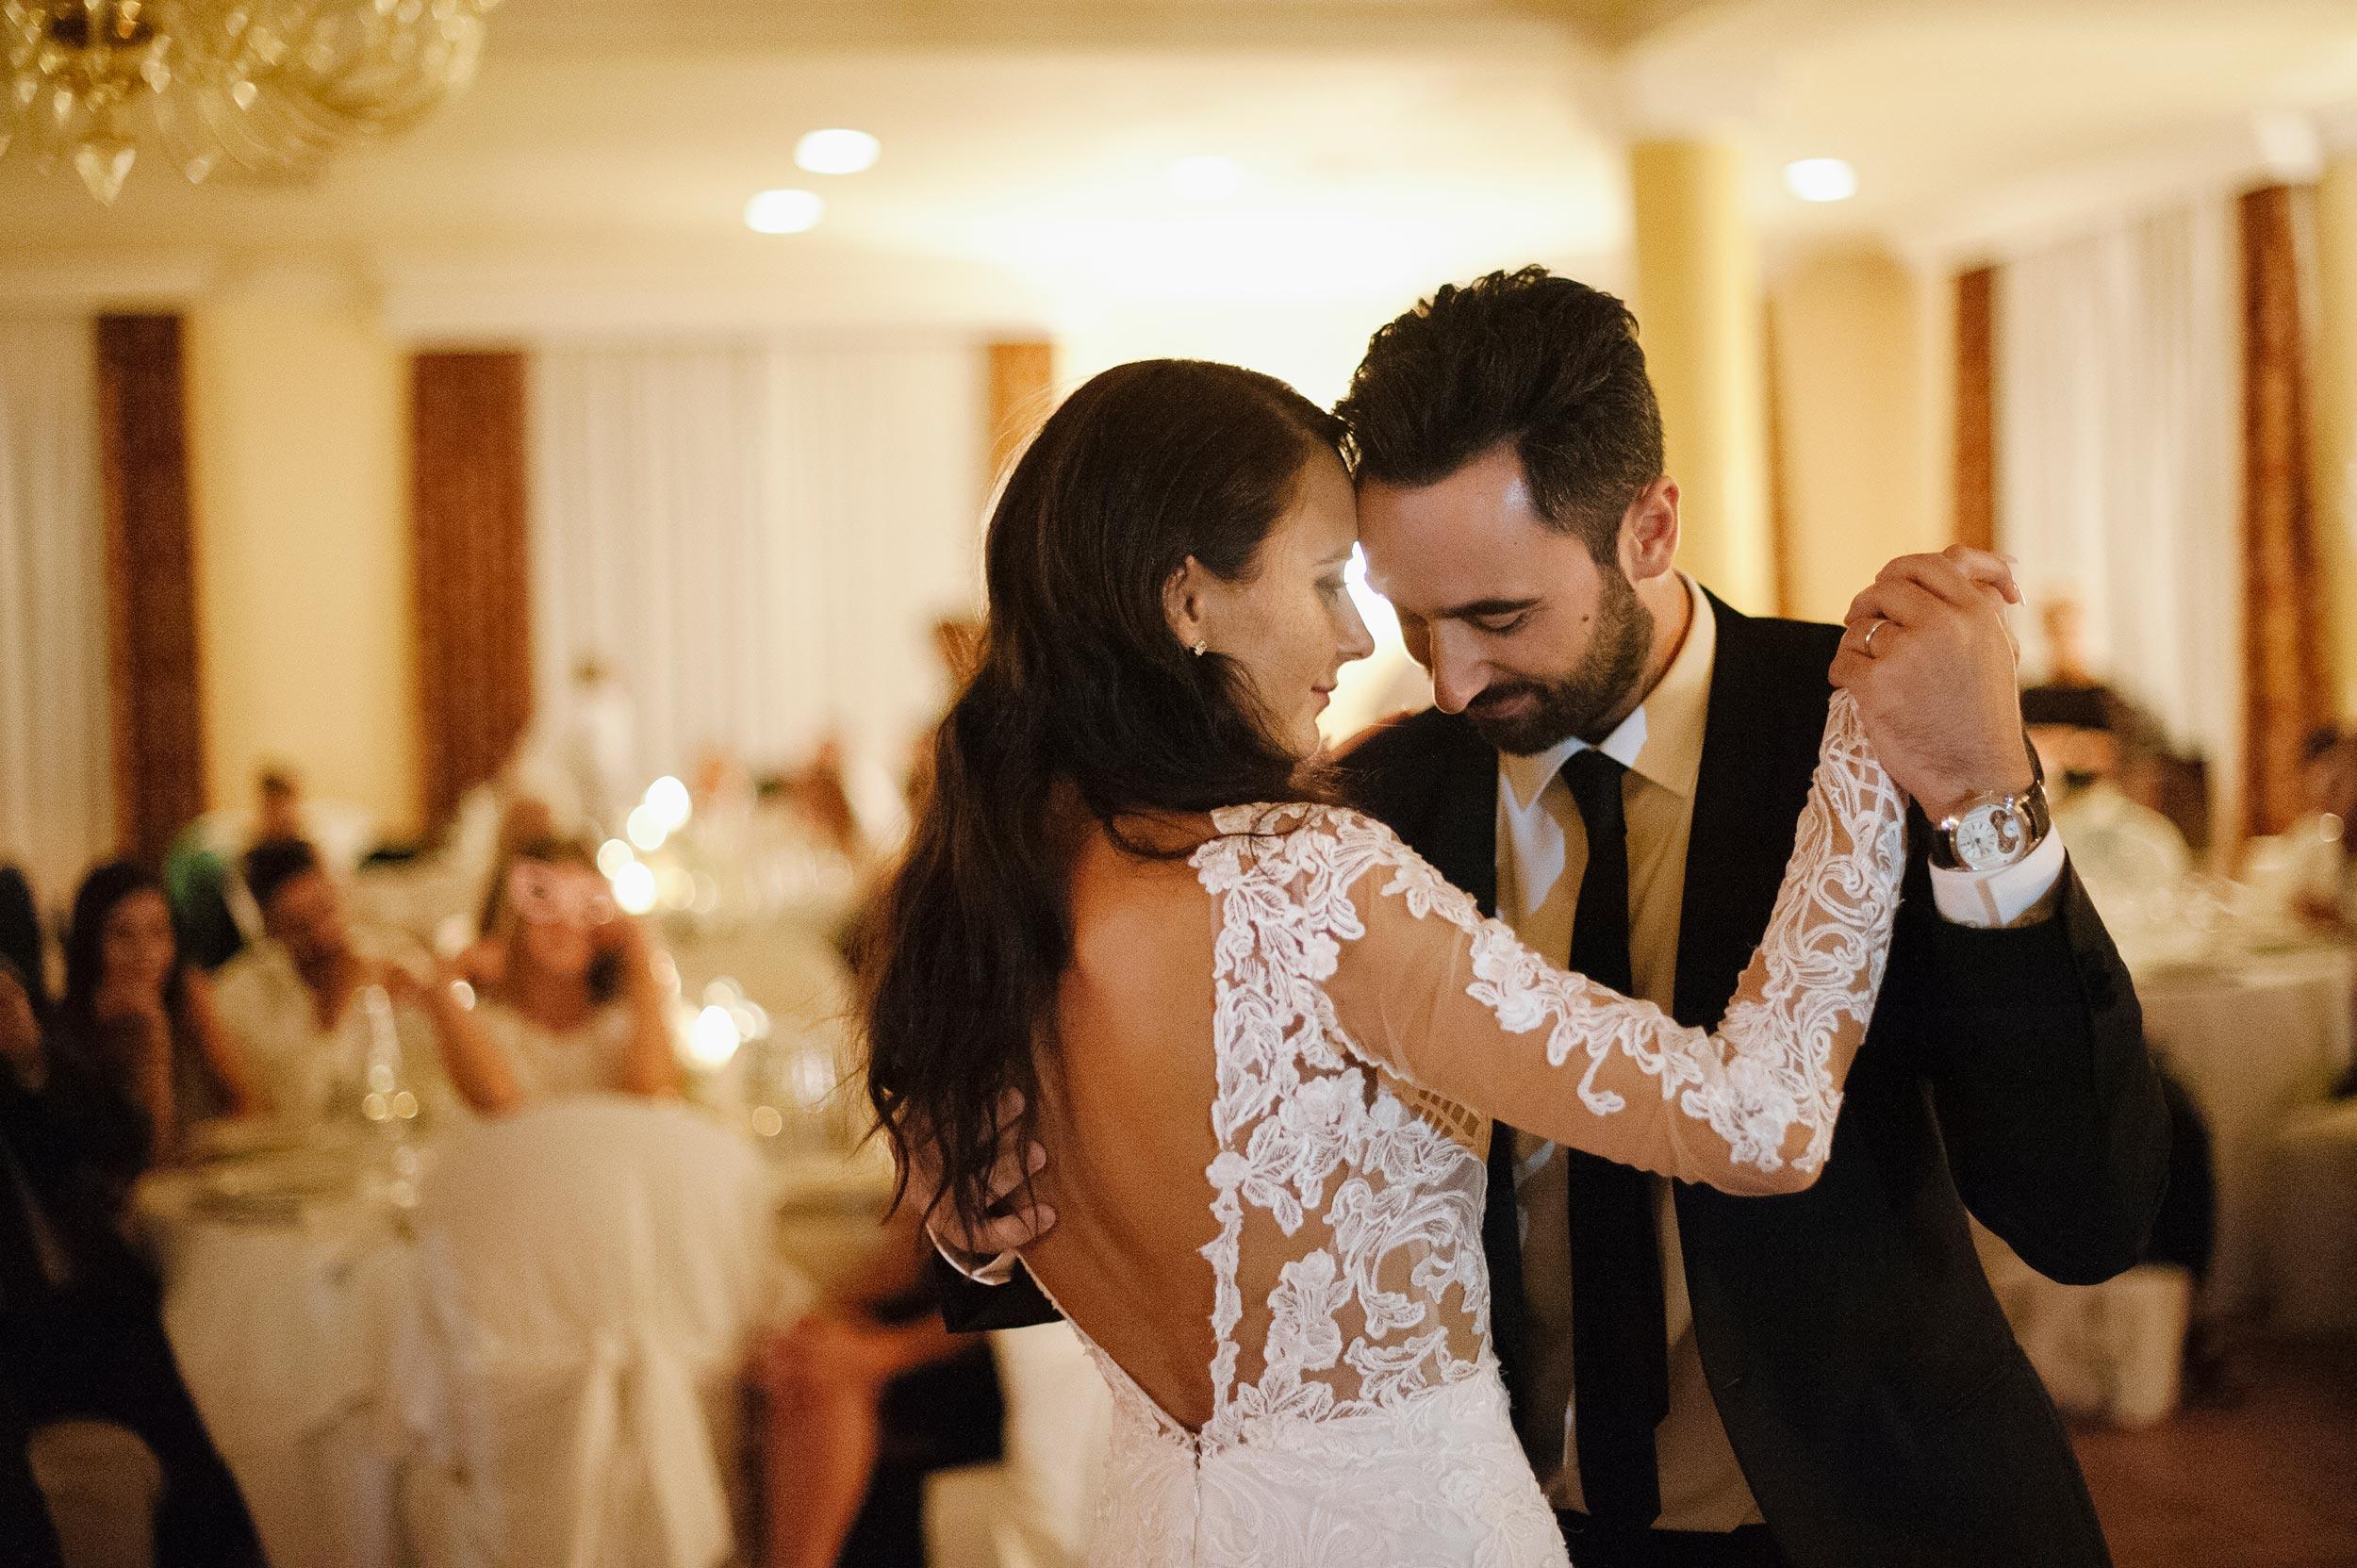 bride-and-groom-dancing-during-the-dinner.jpg